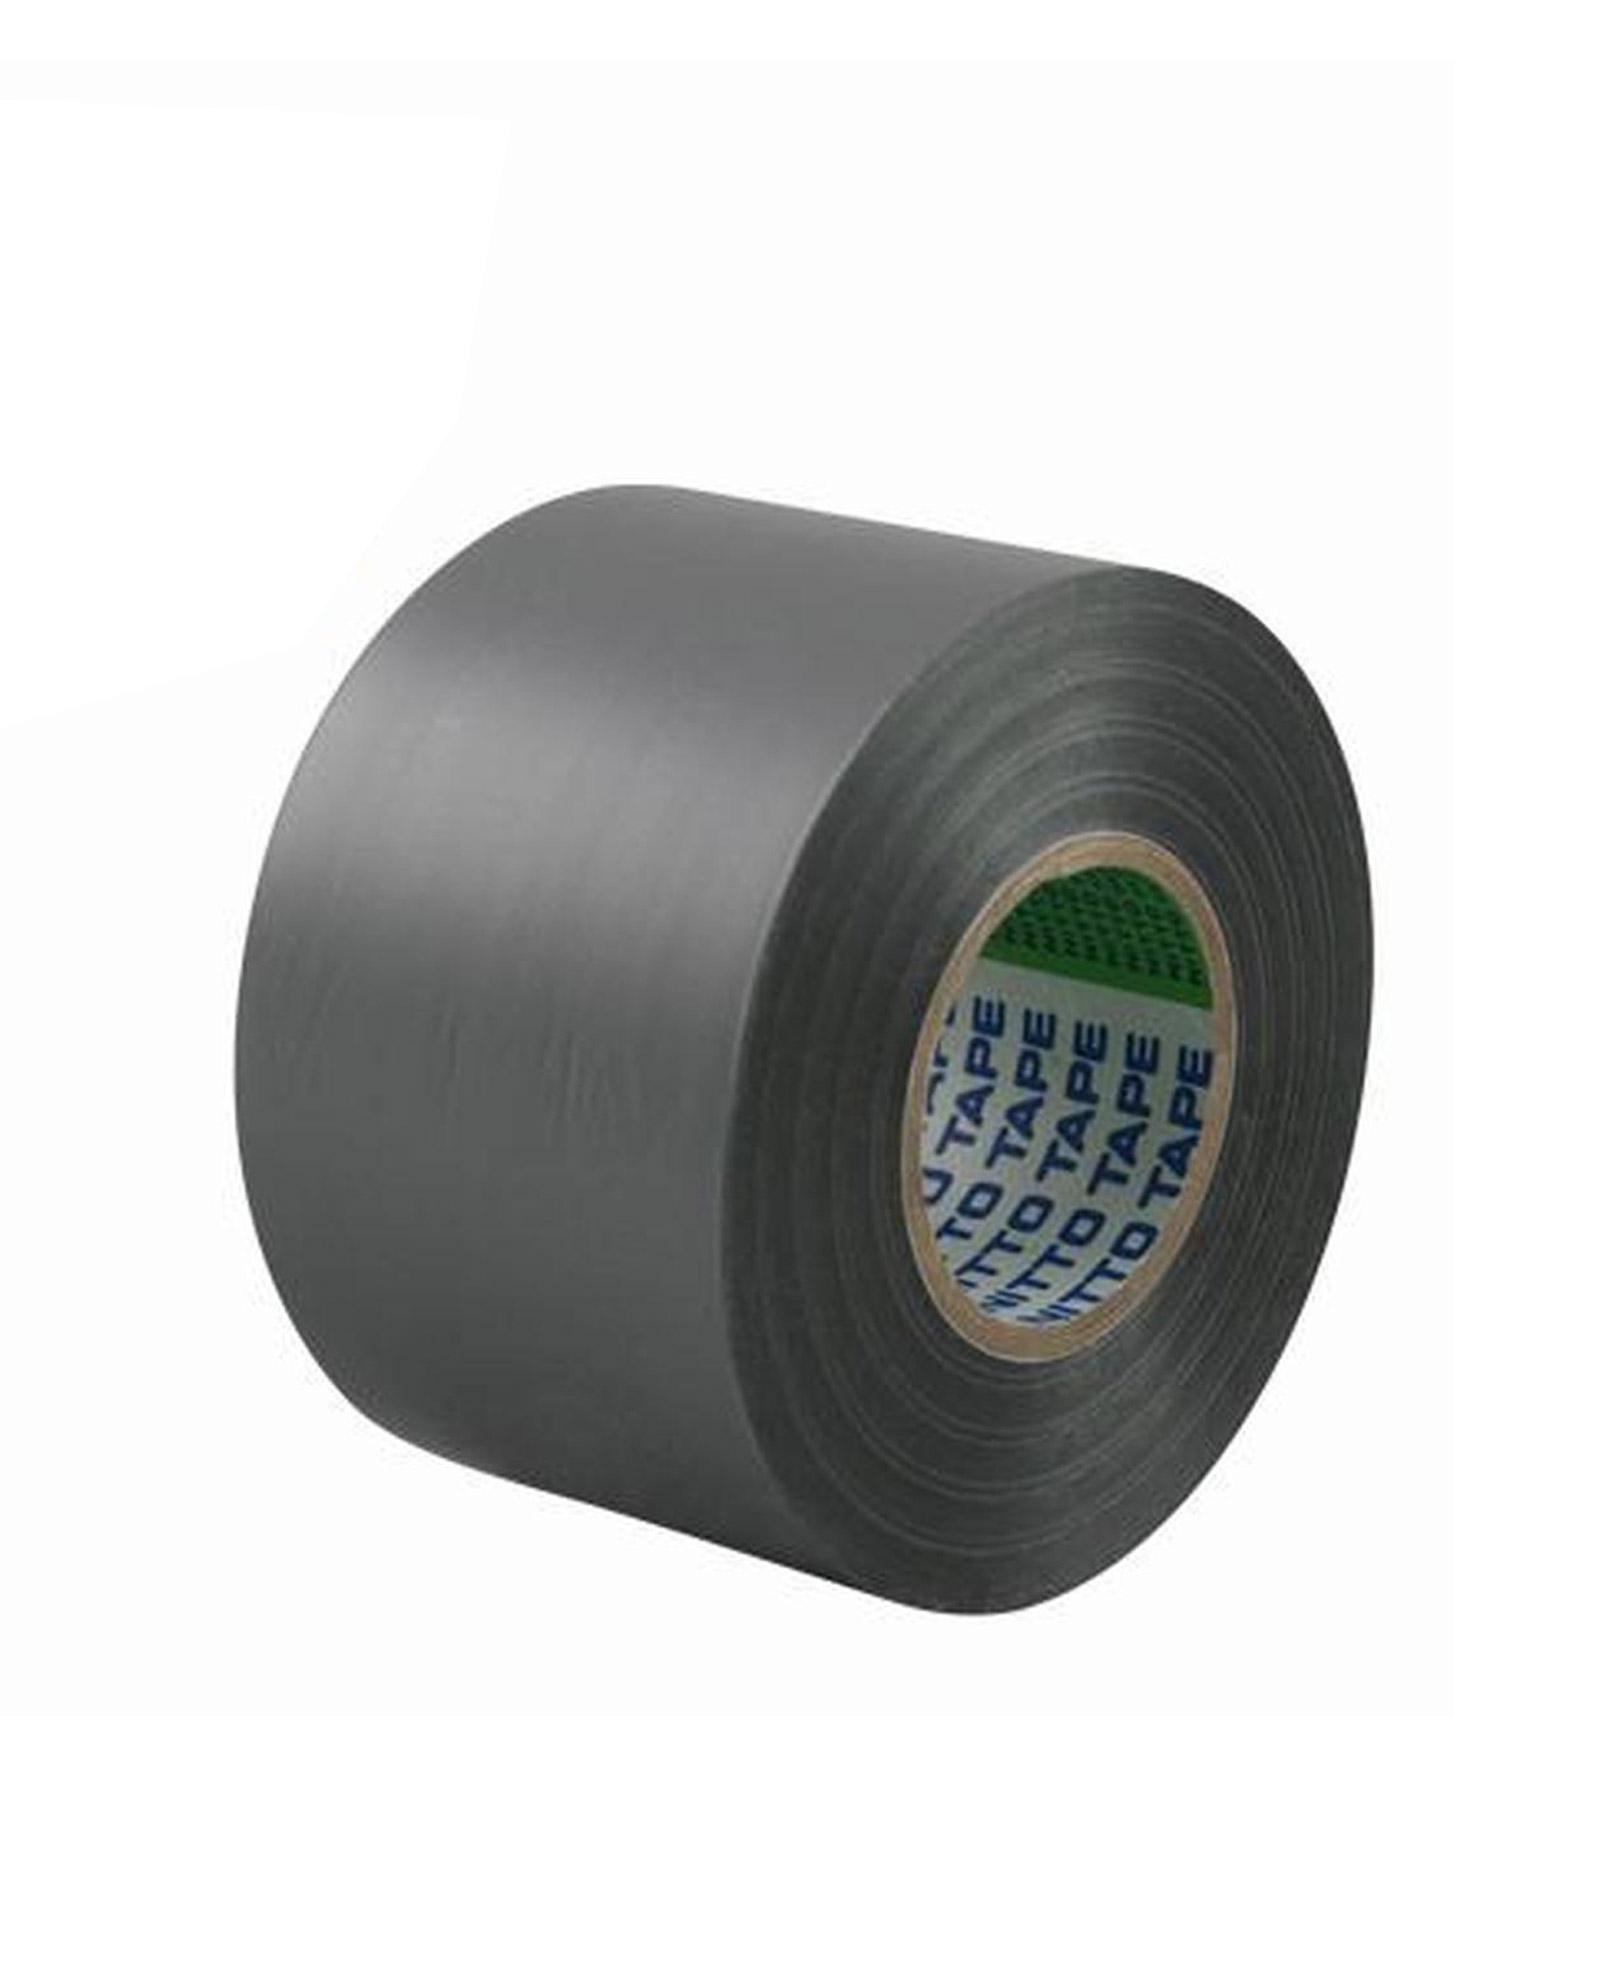 Nitto 204e Pvc Insulation Tape 48mm X 30m Roll